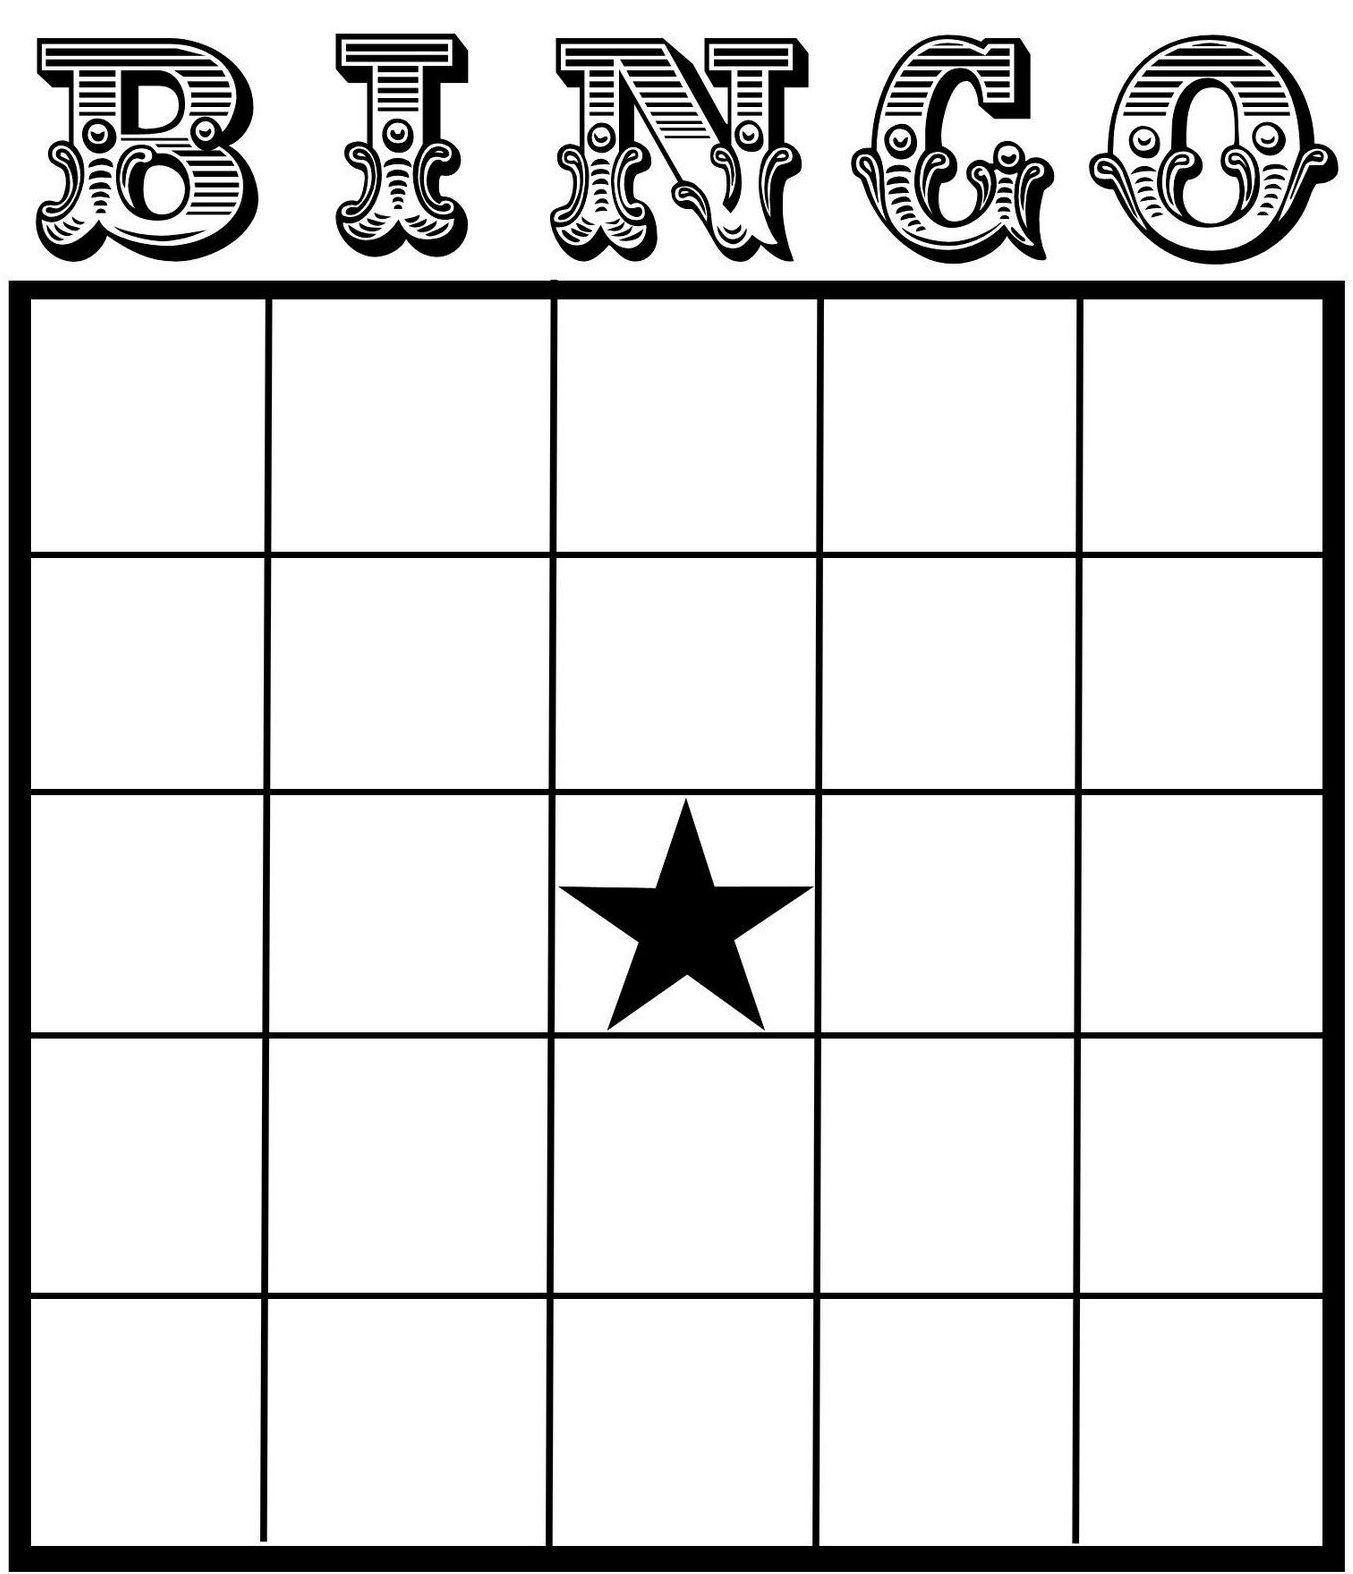 Free Printable Bingo Card Template - Set Your Plan & Tasks With Best - Free Printable Bingo Cards For Teachers